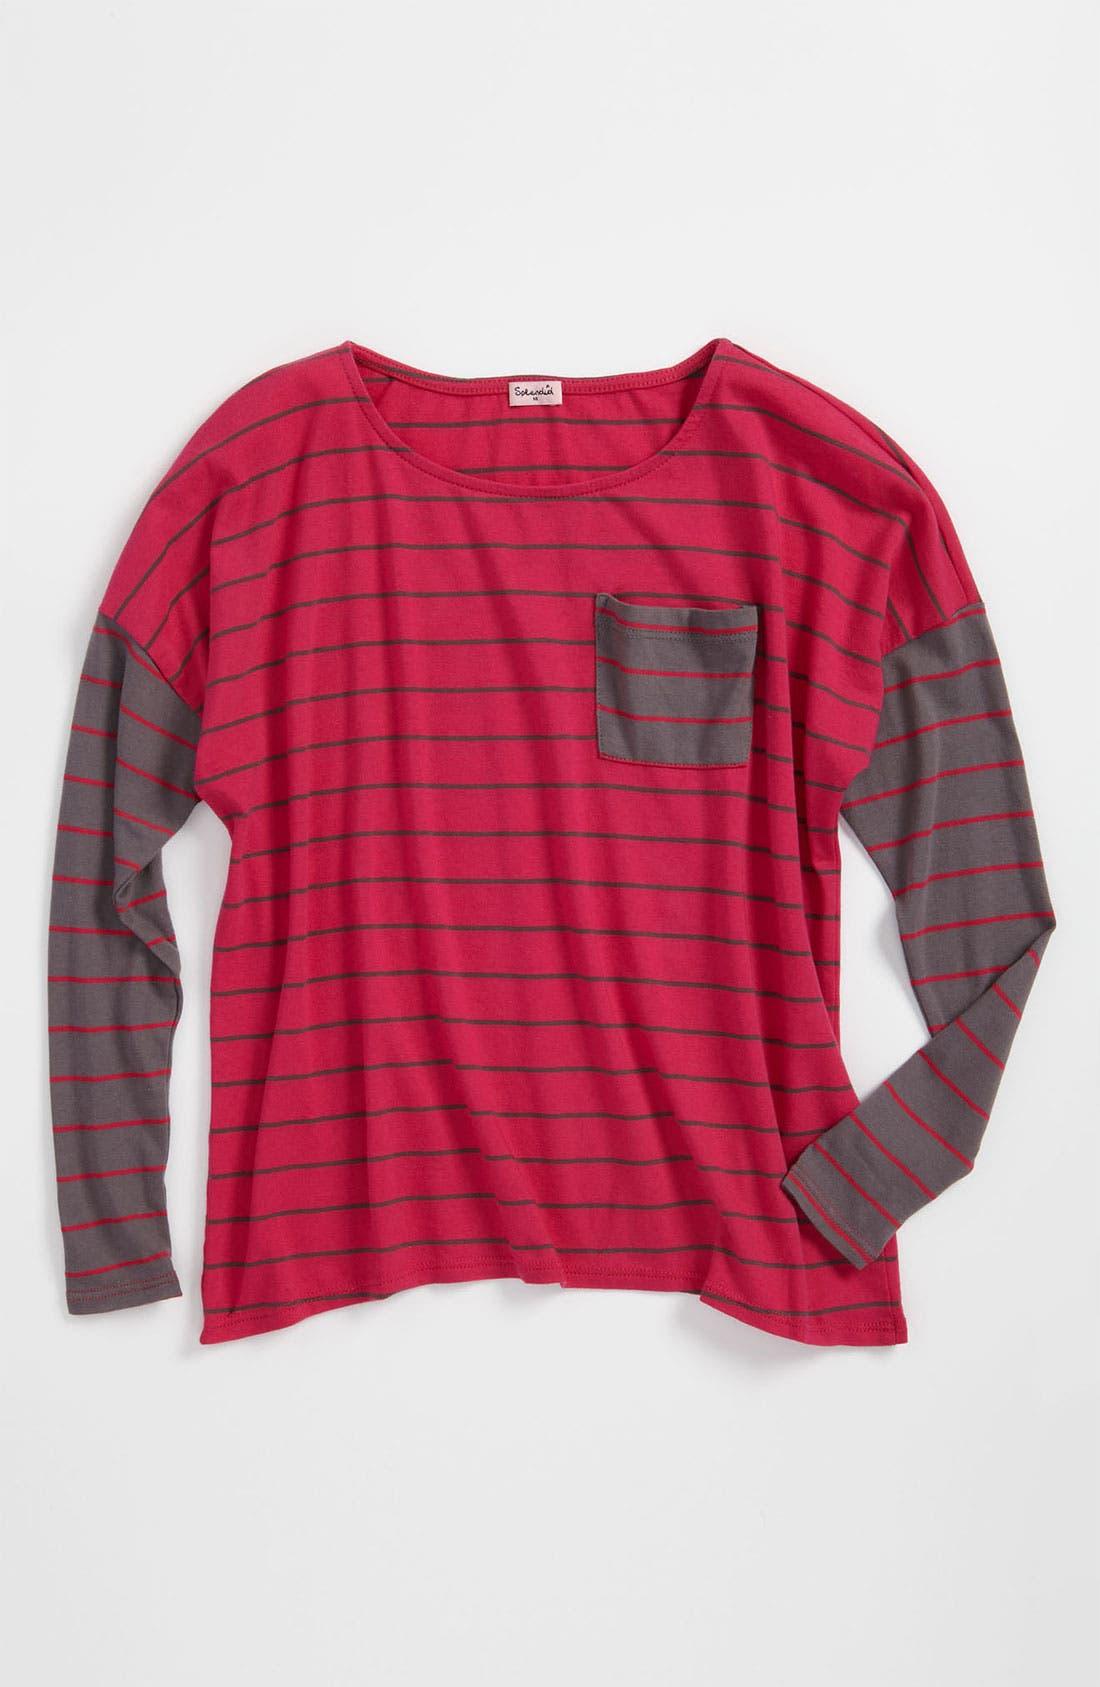 Main Image - Splendid 'Lacrosse' Stripe Top (Big Girls)